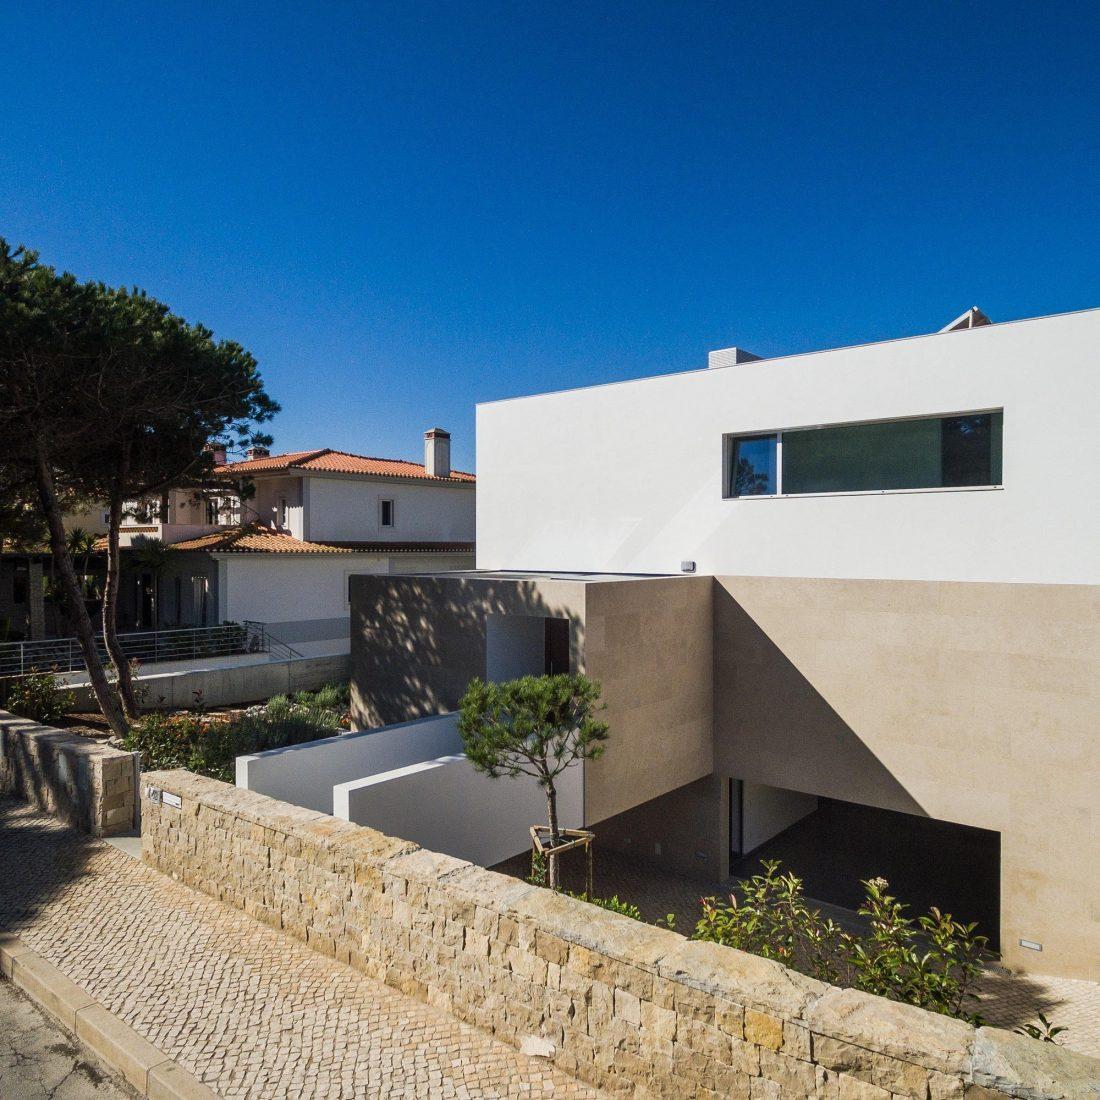 Дом в Обидуше, Португалия, от студии RSM arquitecto и Russell Jones Architects 12